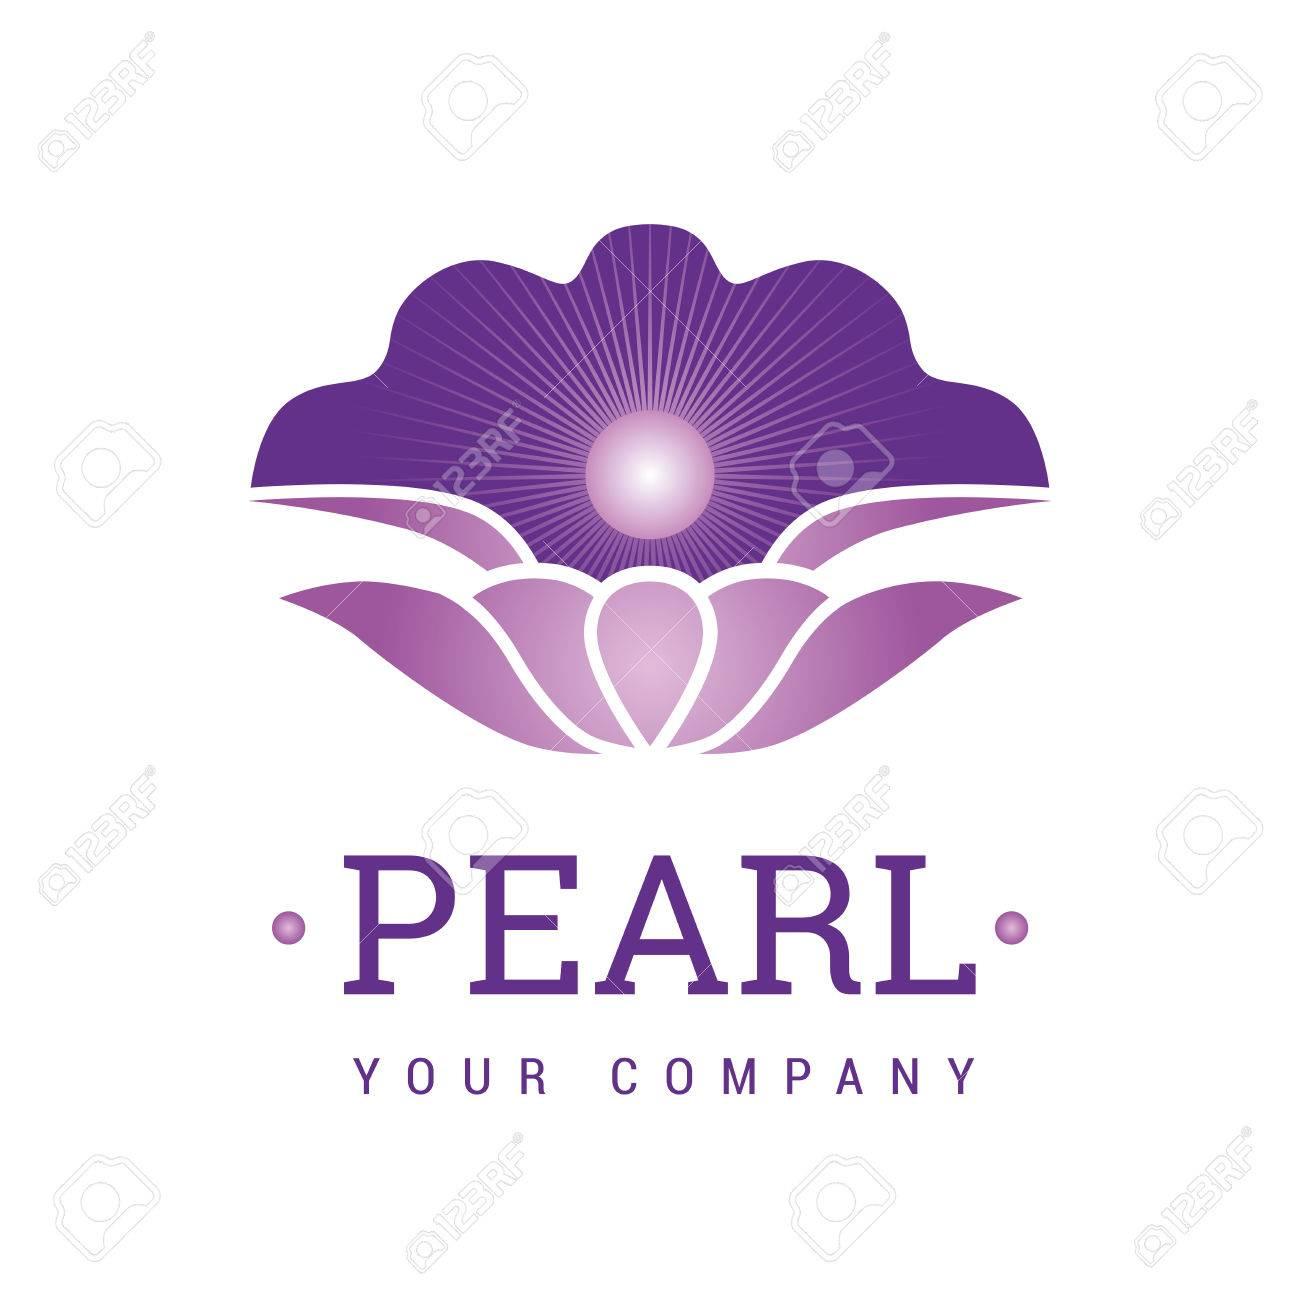 921df3129103 Sea Shell. Opened Shell With Purple Inside. For Beauty Shop ...